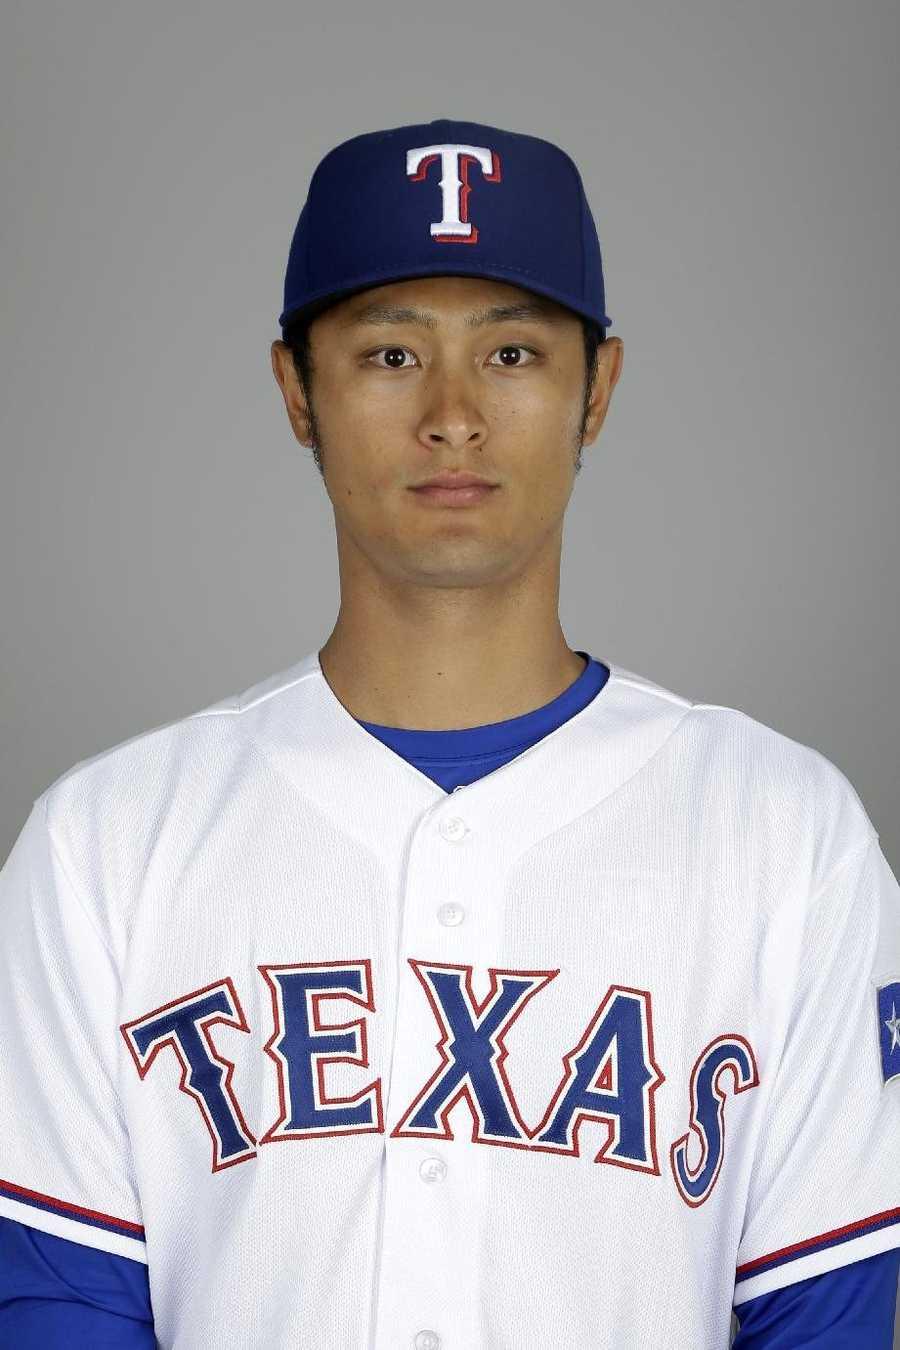 19) Yu Darvish, Texas Rangers